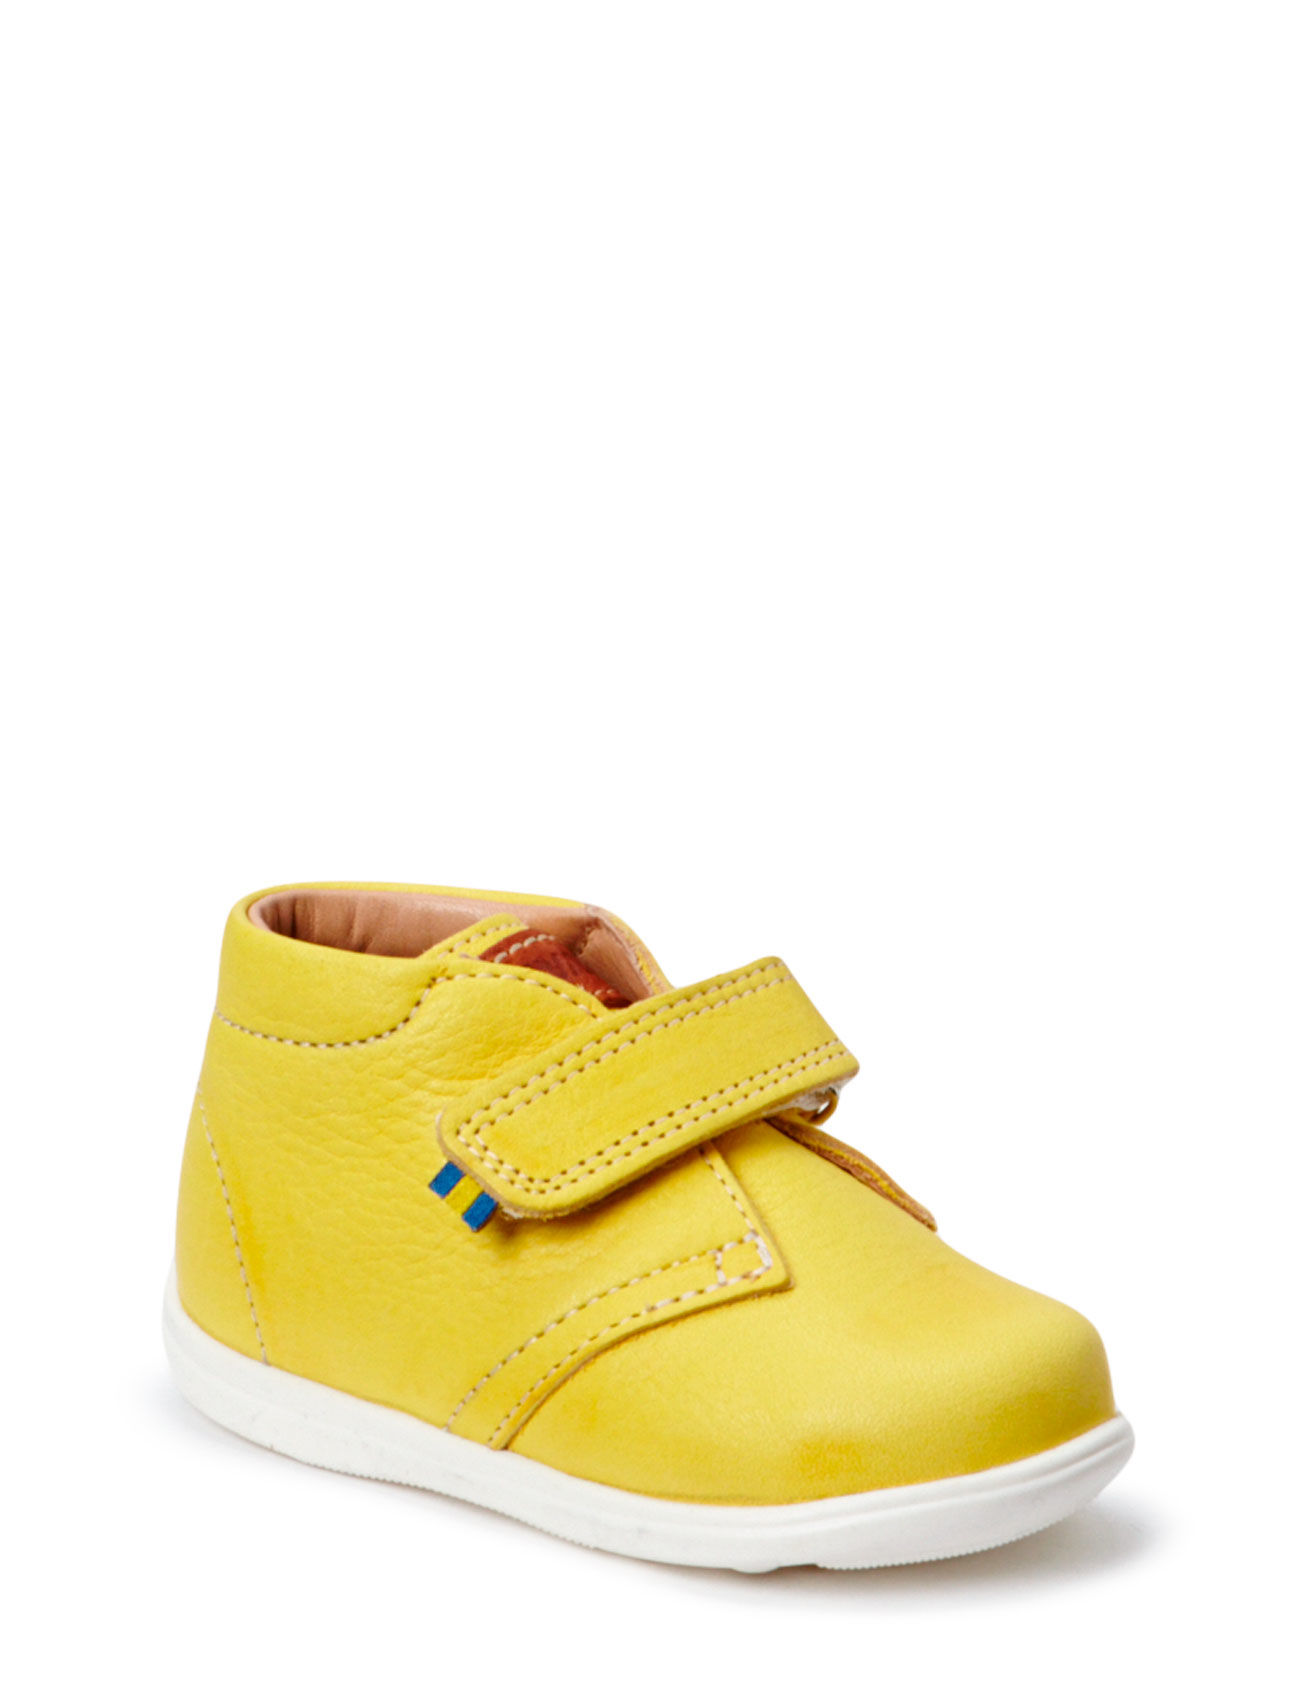 Hammar Ep Spring/Autumn Shoe